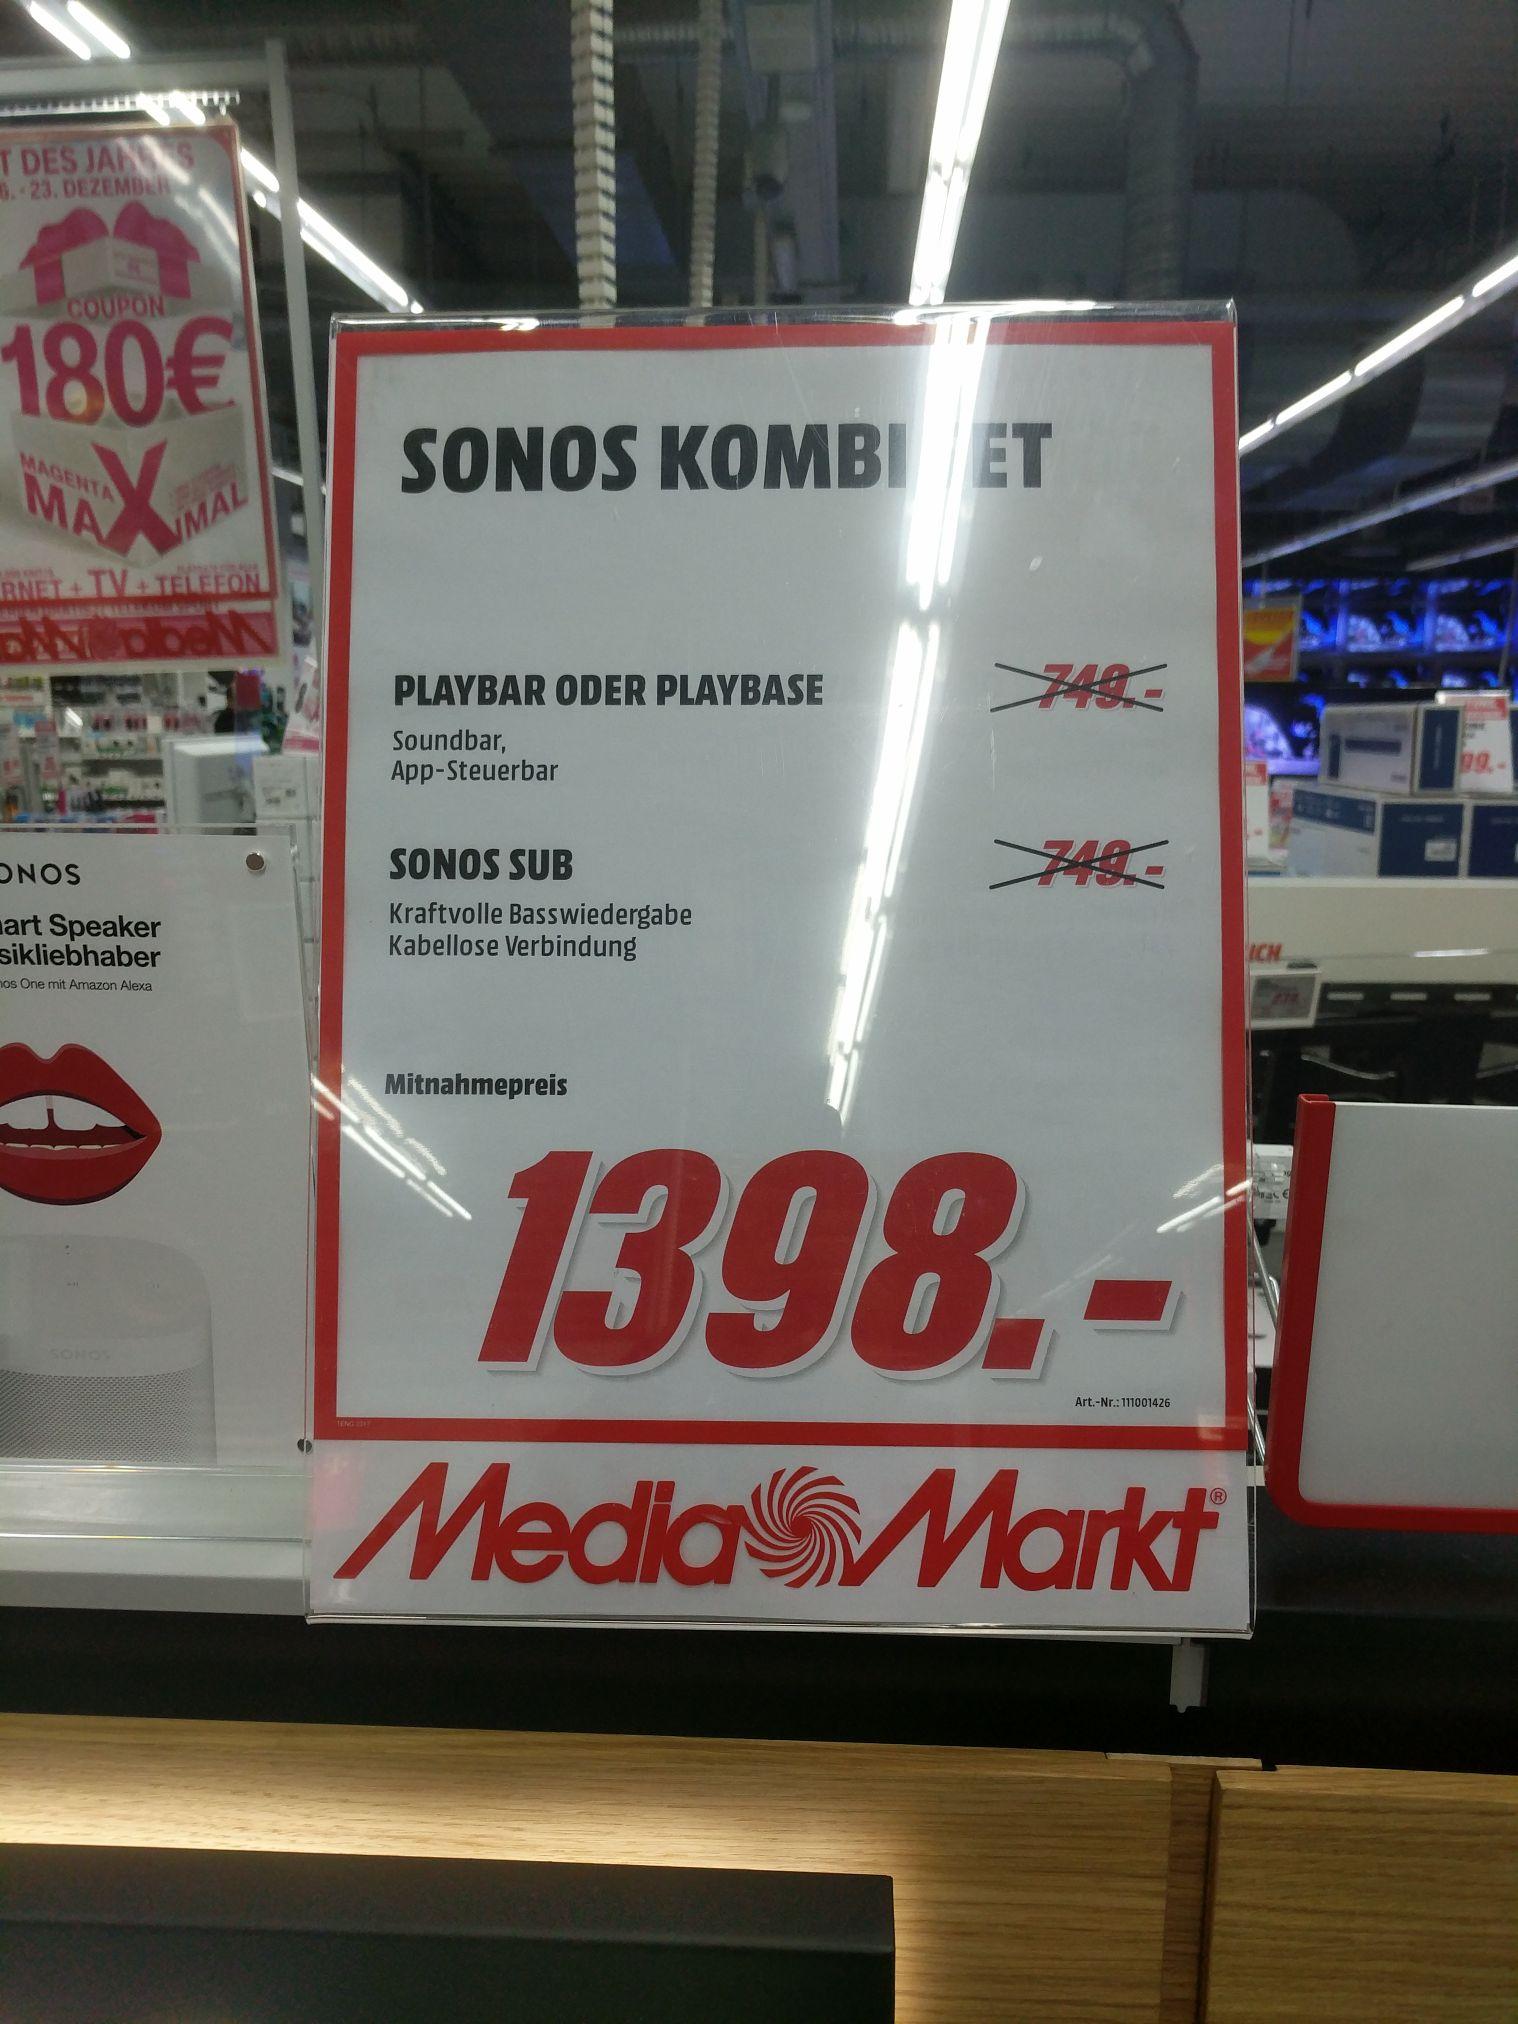 Sonos Setpreis mit Playbar & Sub